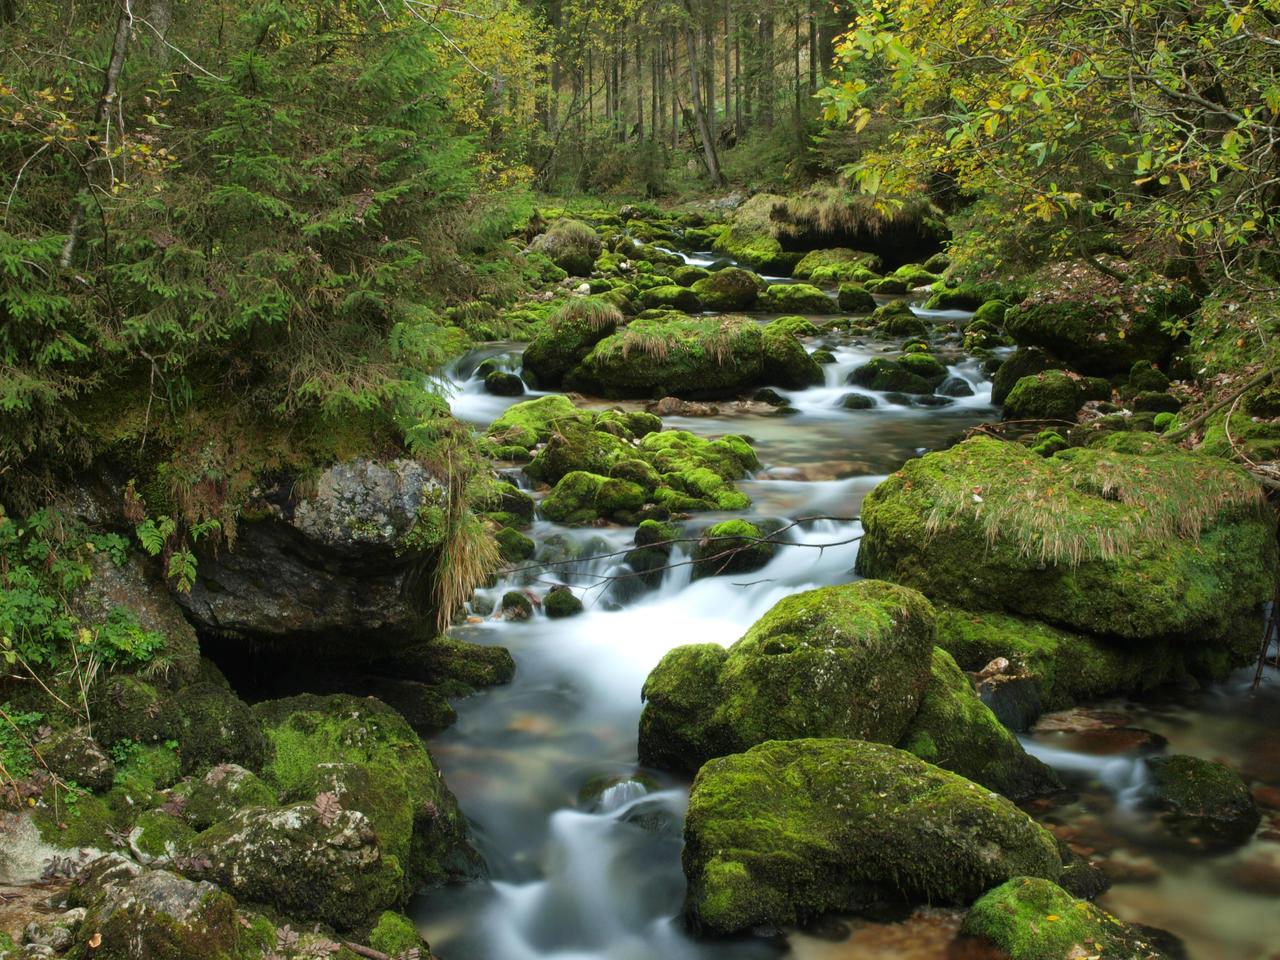 Whispering River by Burtn